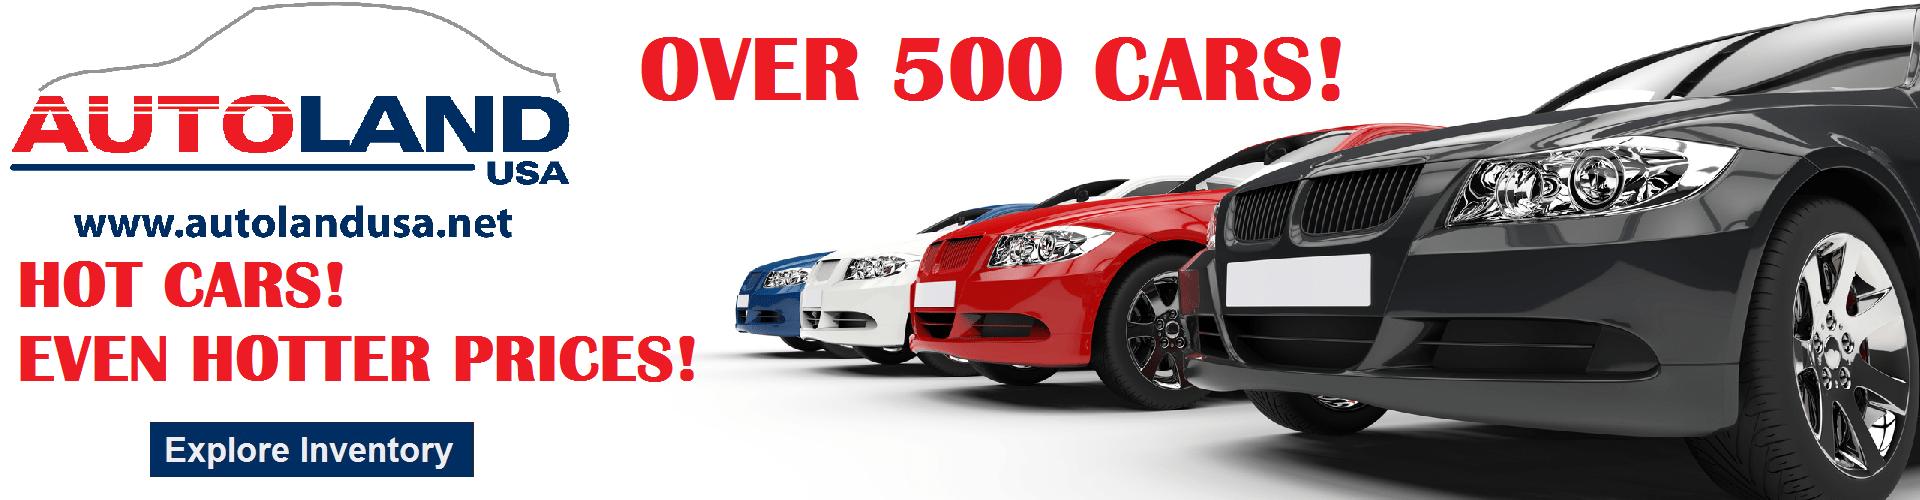 car+cruise+com